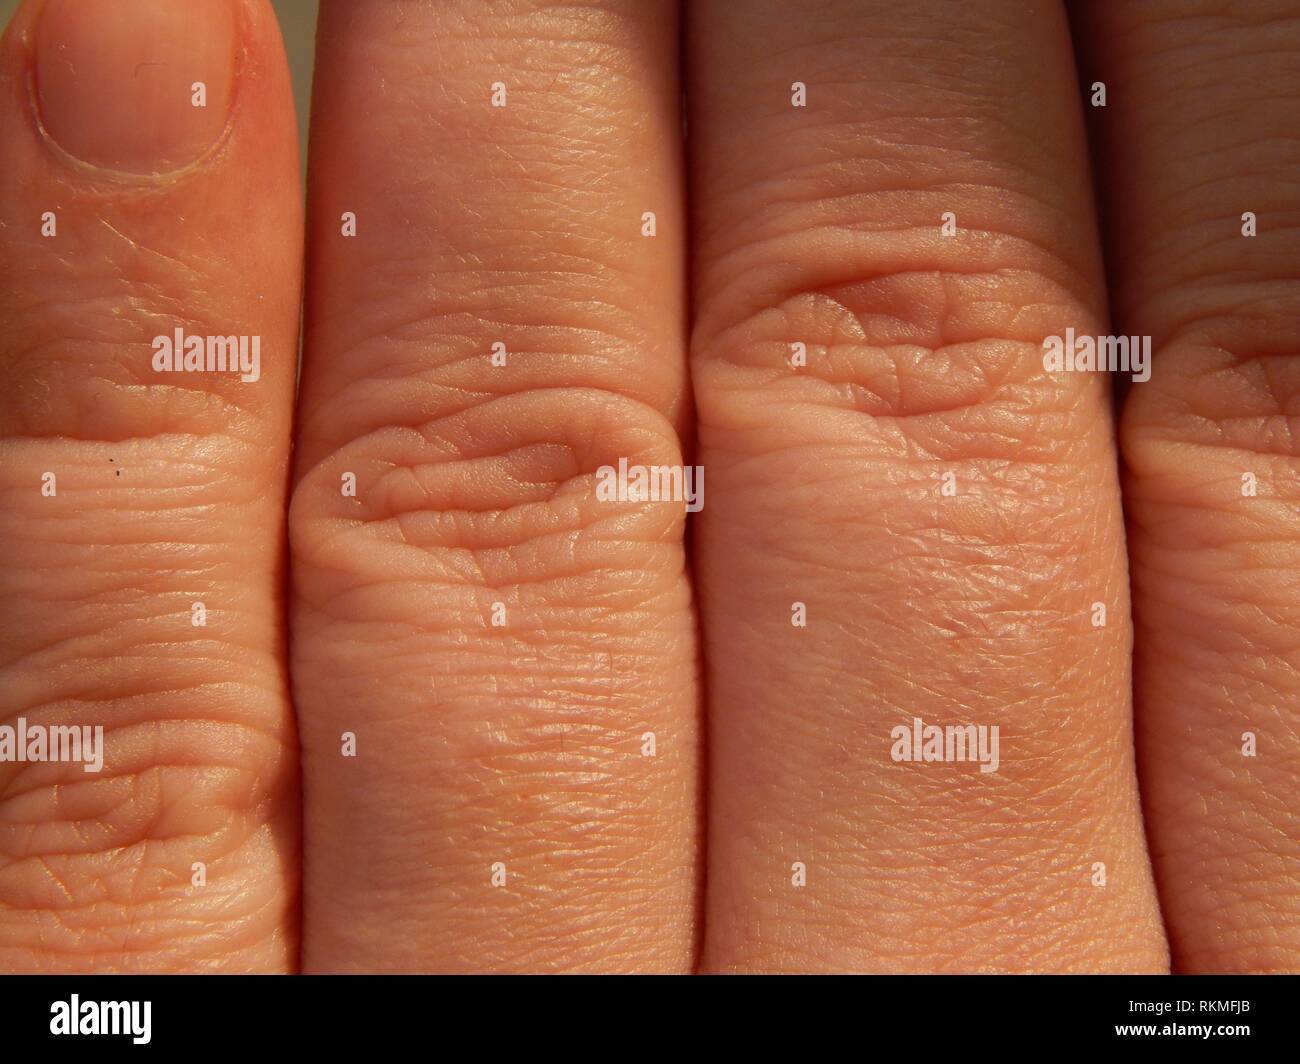 La pelle umana texture in varie parti del corpo. Immagini Stock